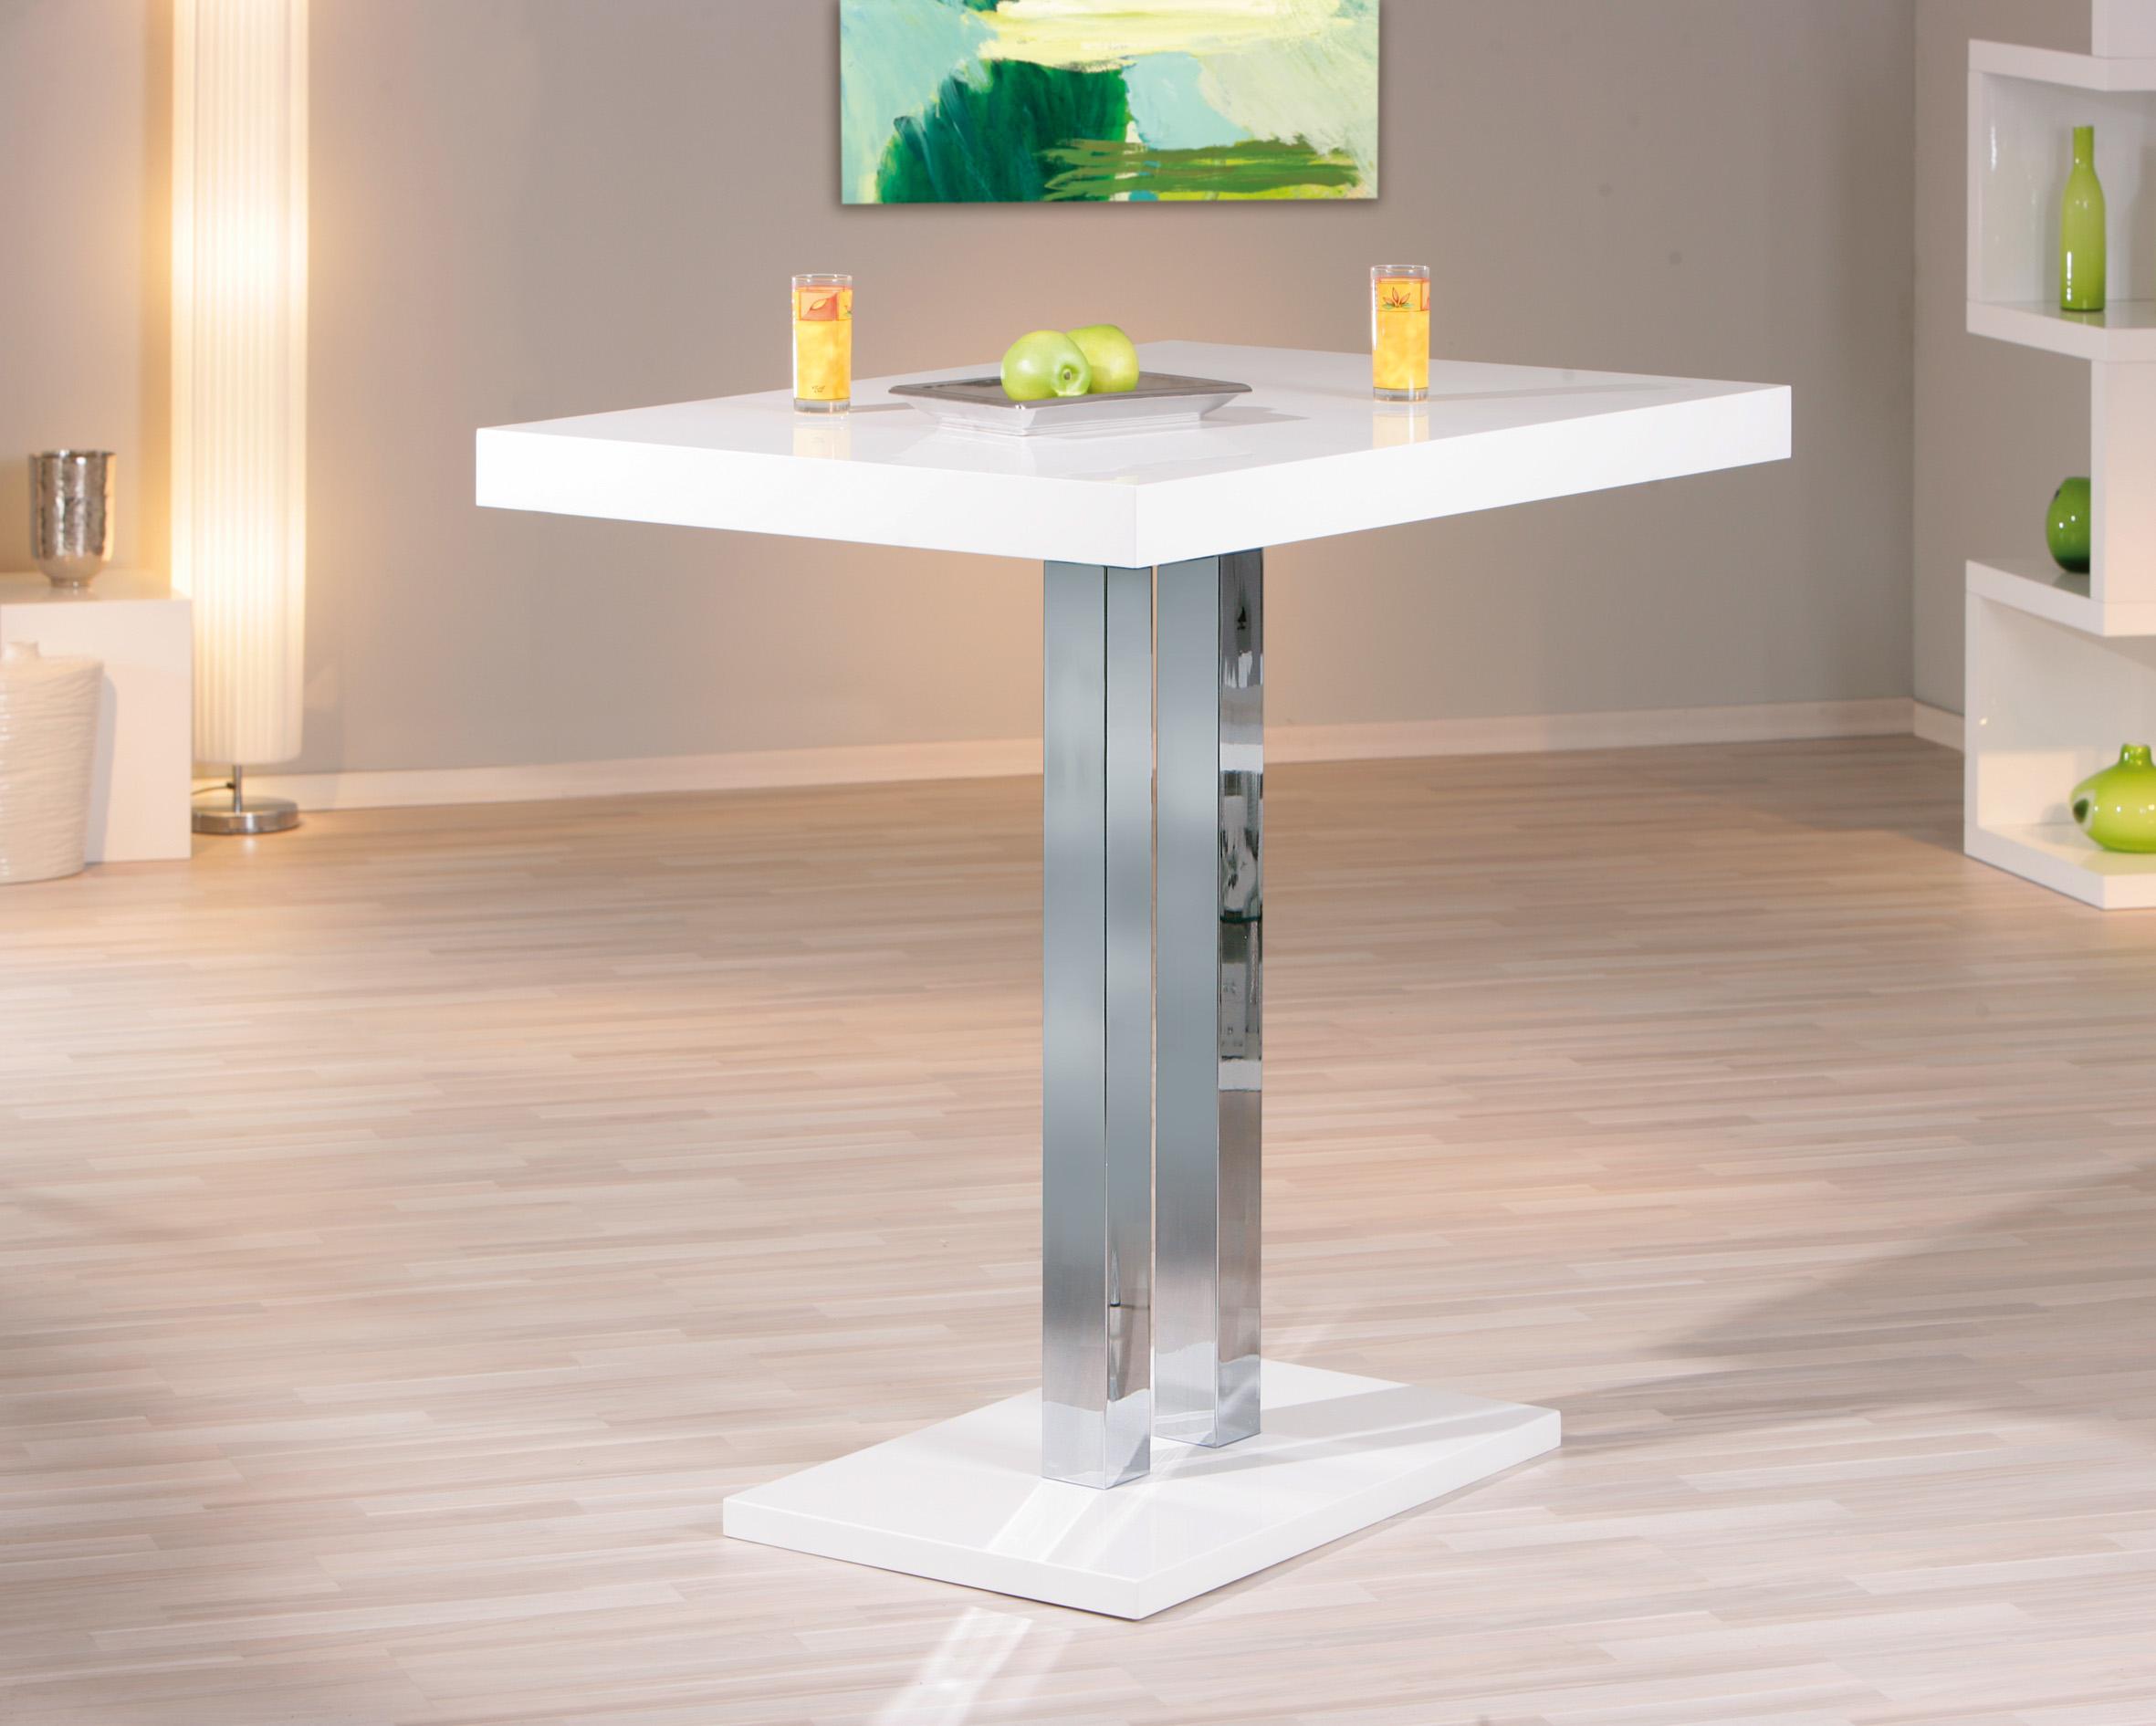 Hoge Tafel Ikea : Vierkante tafel ikea awesome affordable best interesting ikea